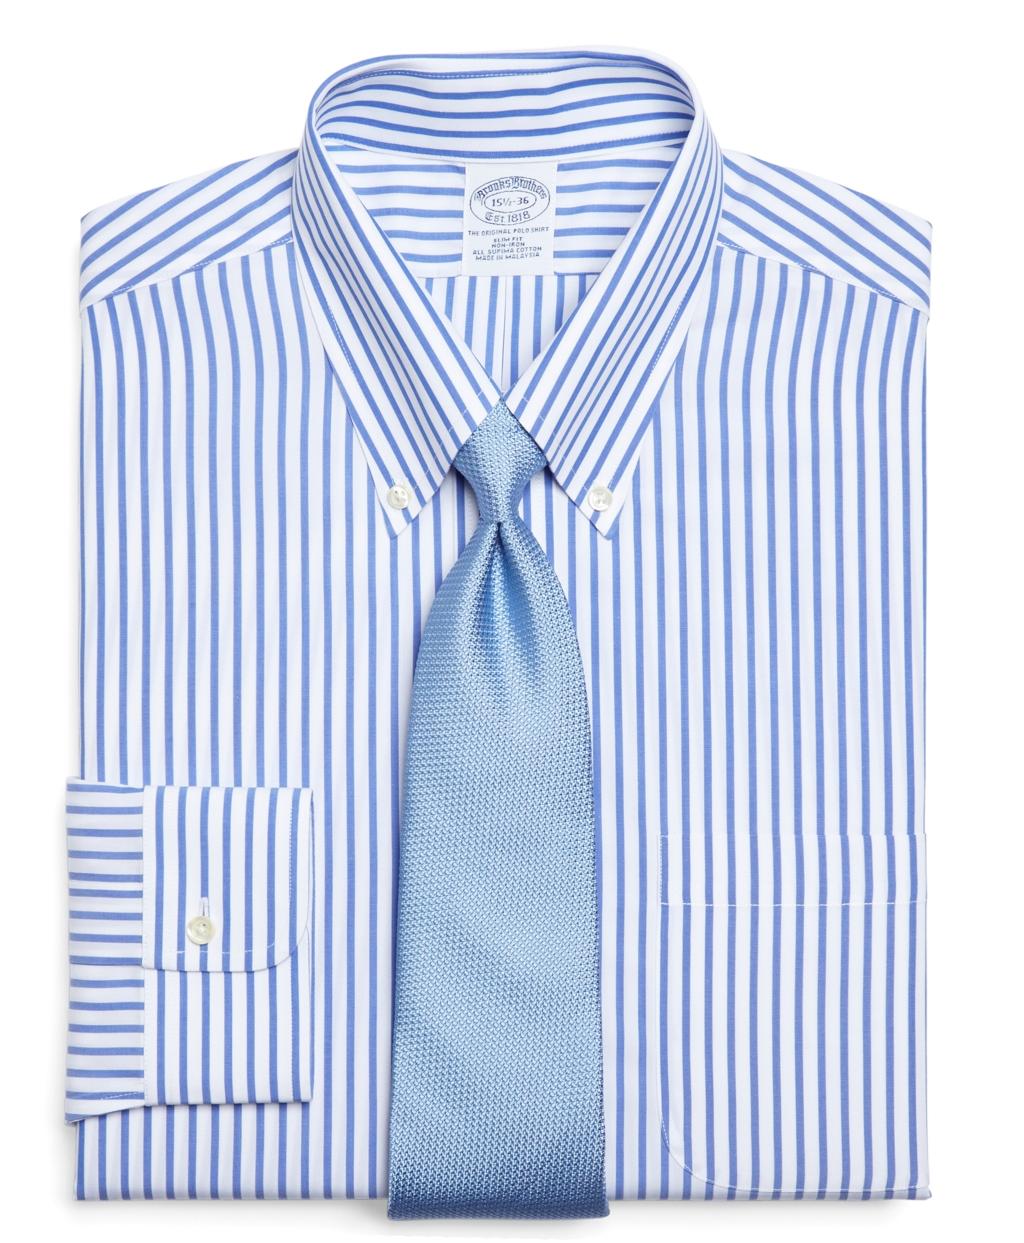 Brooks brothers supima cotton non iron regular fit bold for Supima cotton dress shirts